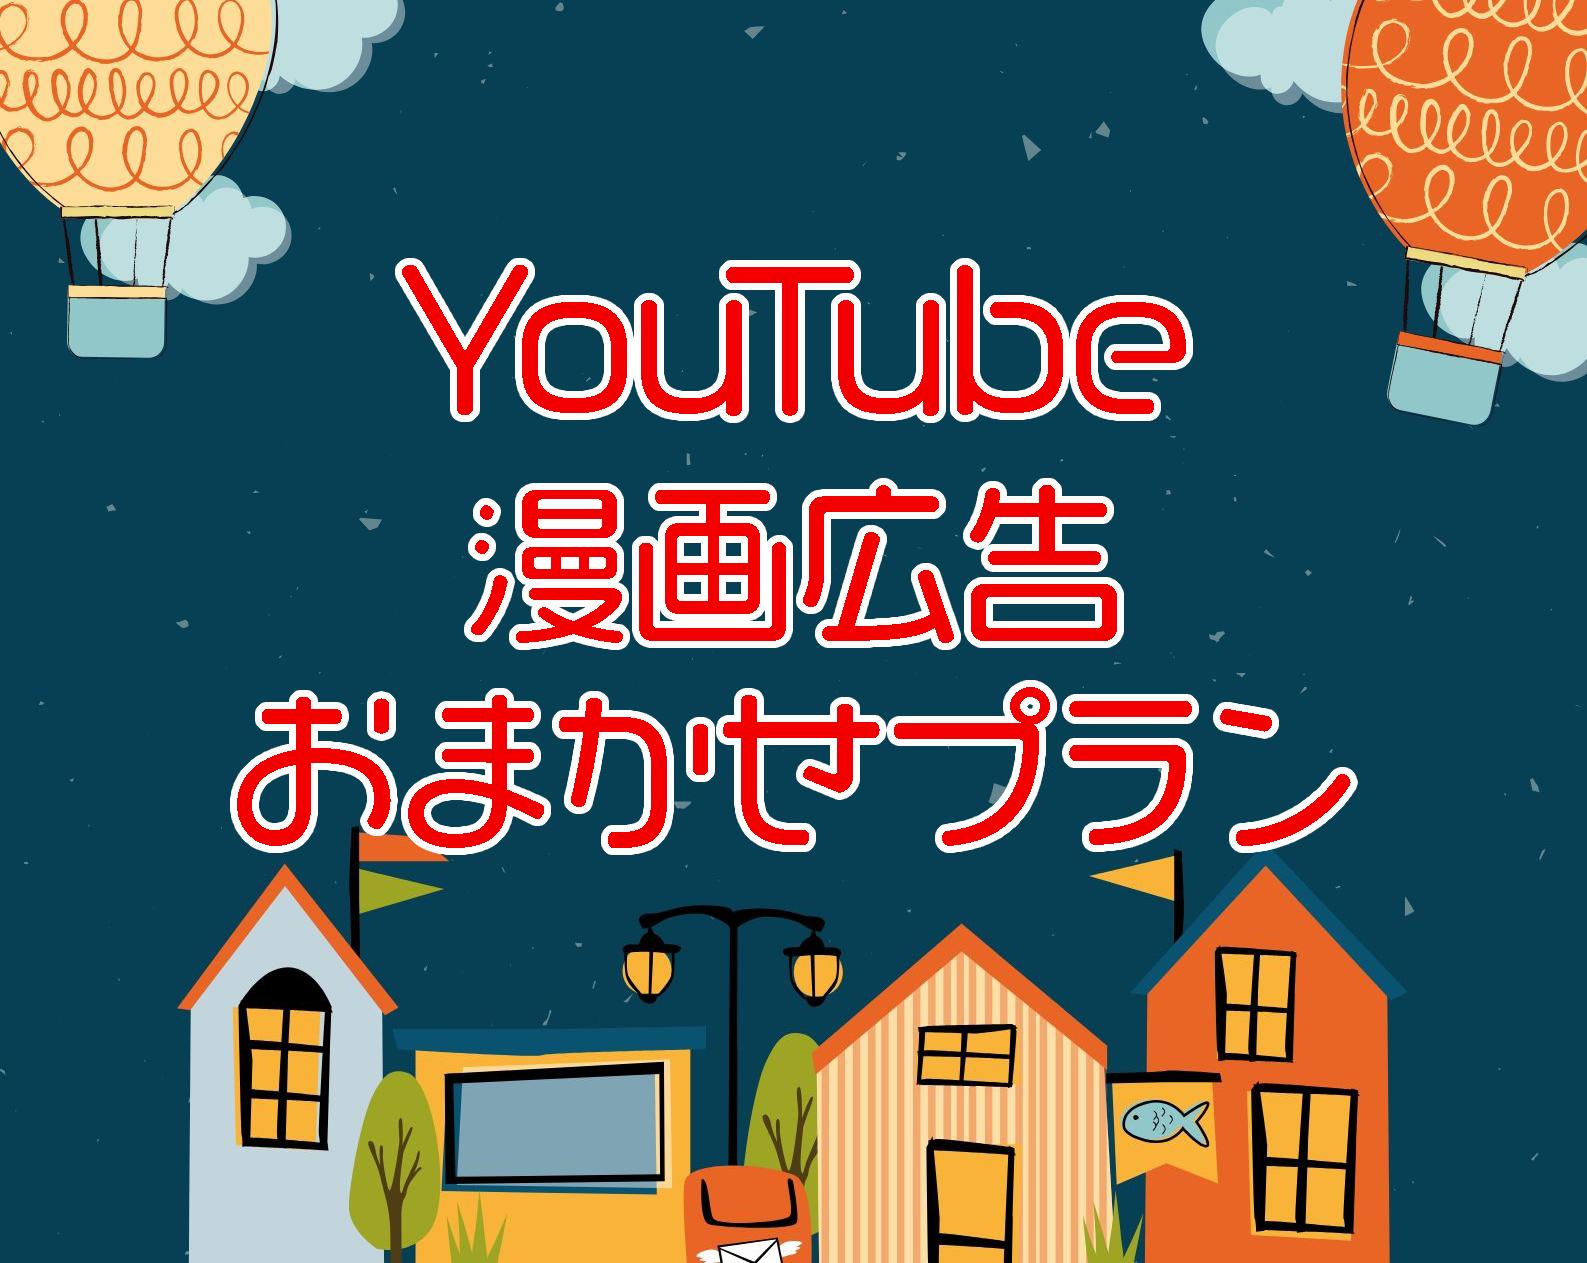 YouTubeの漫画広告動画『YouTube漫画広告おまかせプラン』を開始【株式会社pamxy】